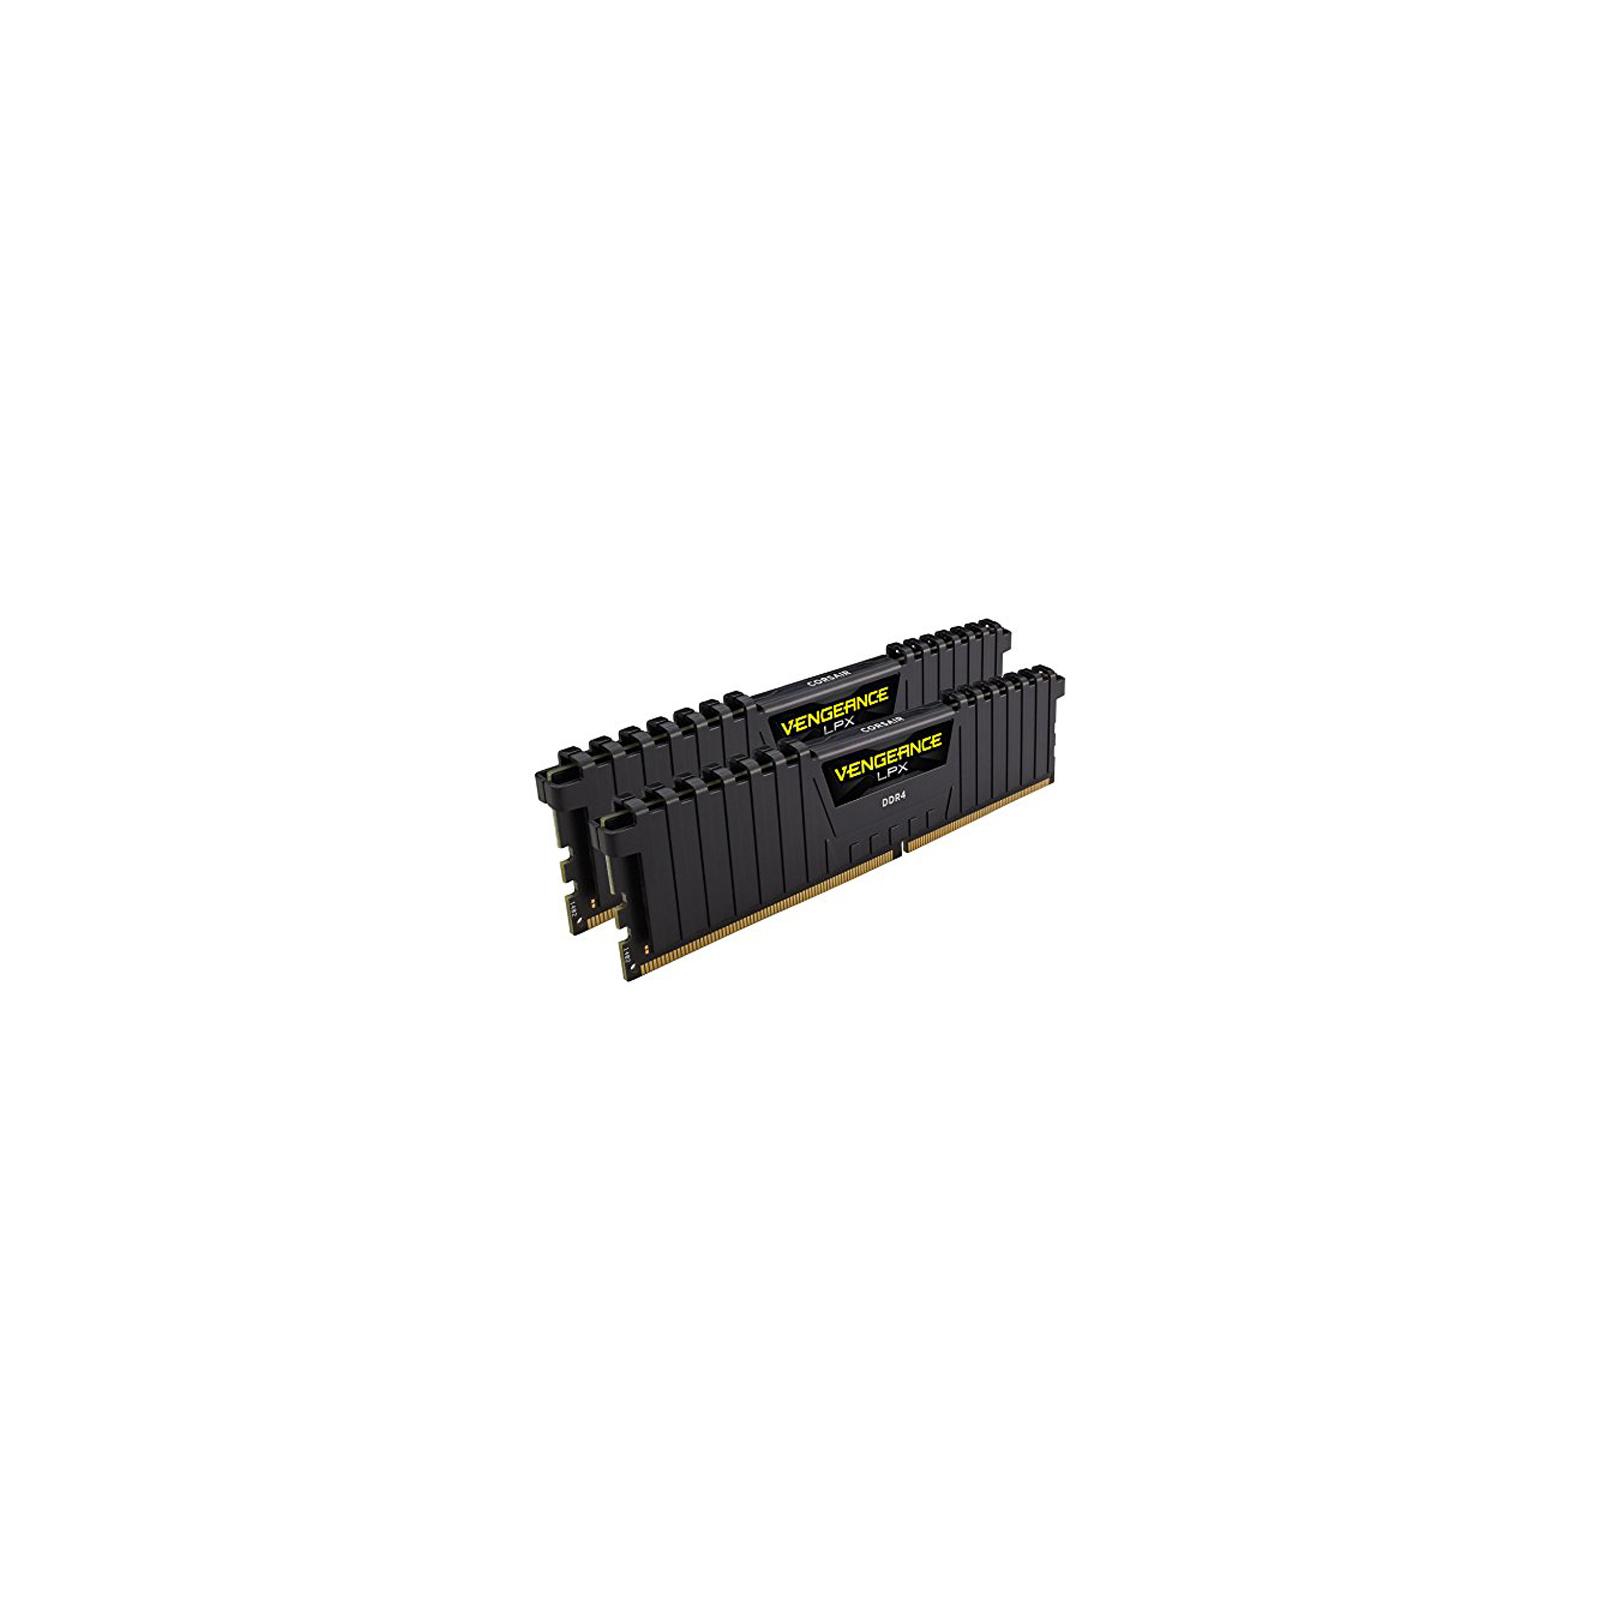 Модуль памяти для компьютера DDR4 16GB (2x8GB) 2666 MHz Vengeance LPX Black CORSAIR (CMK16GX4M2A2666C16) изображение 3